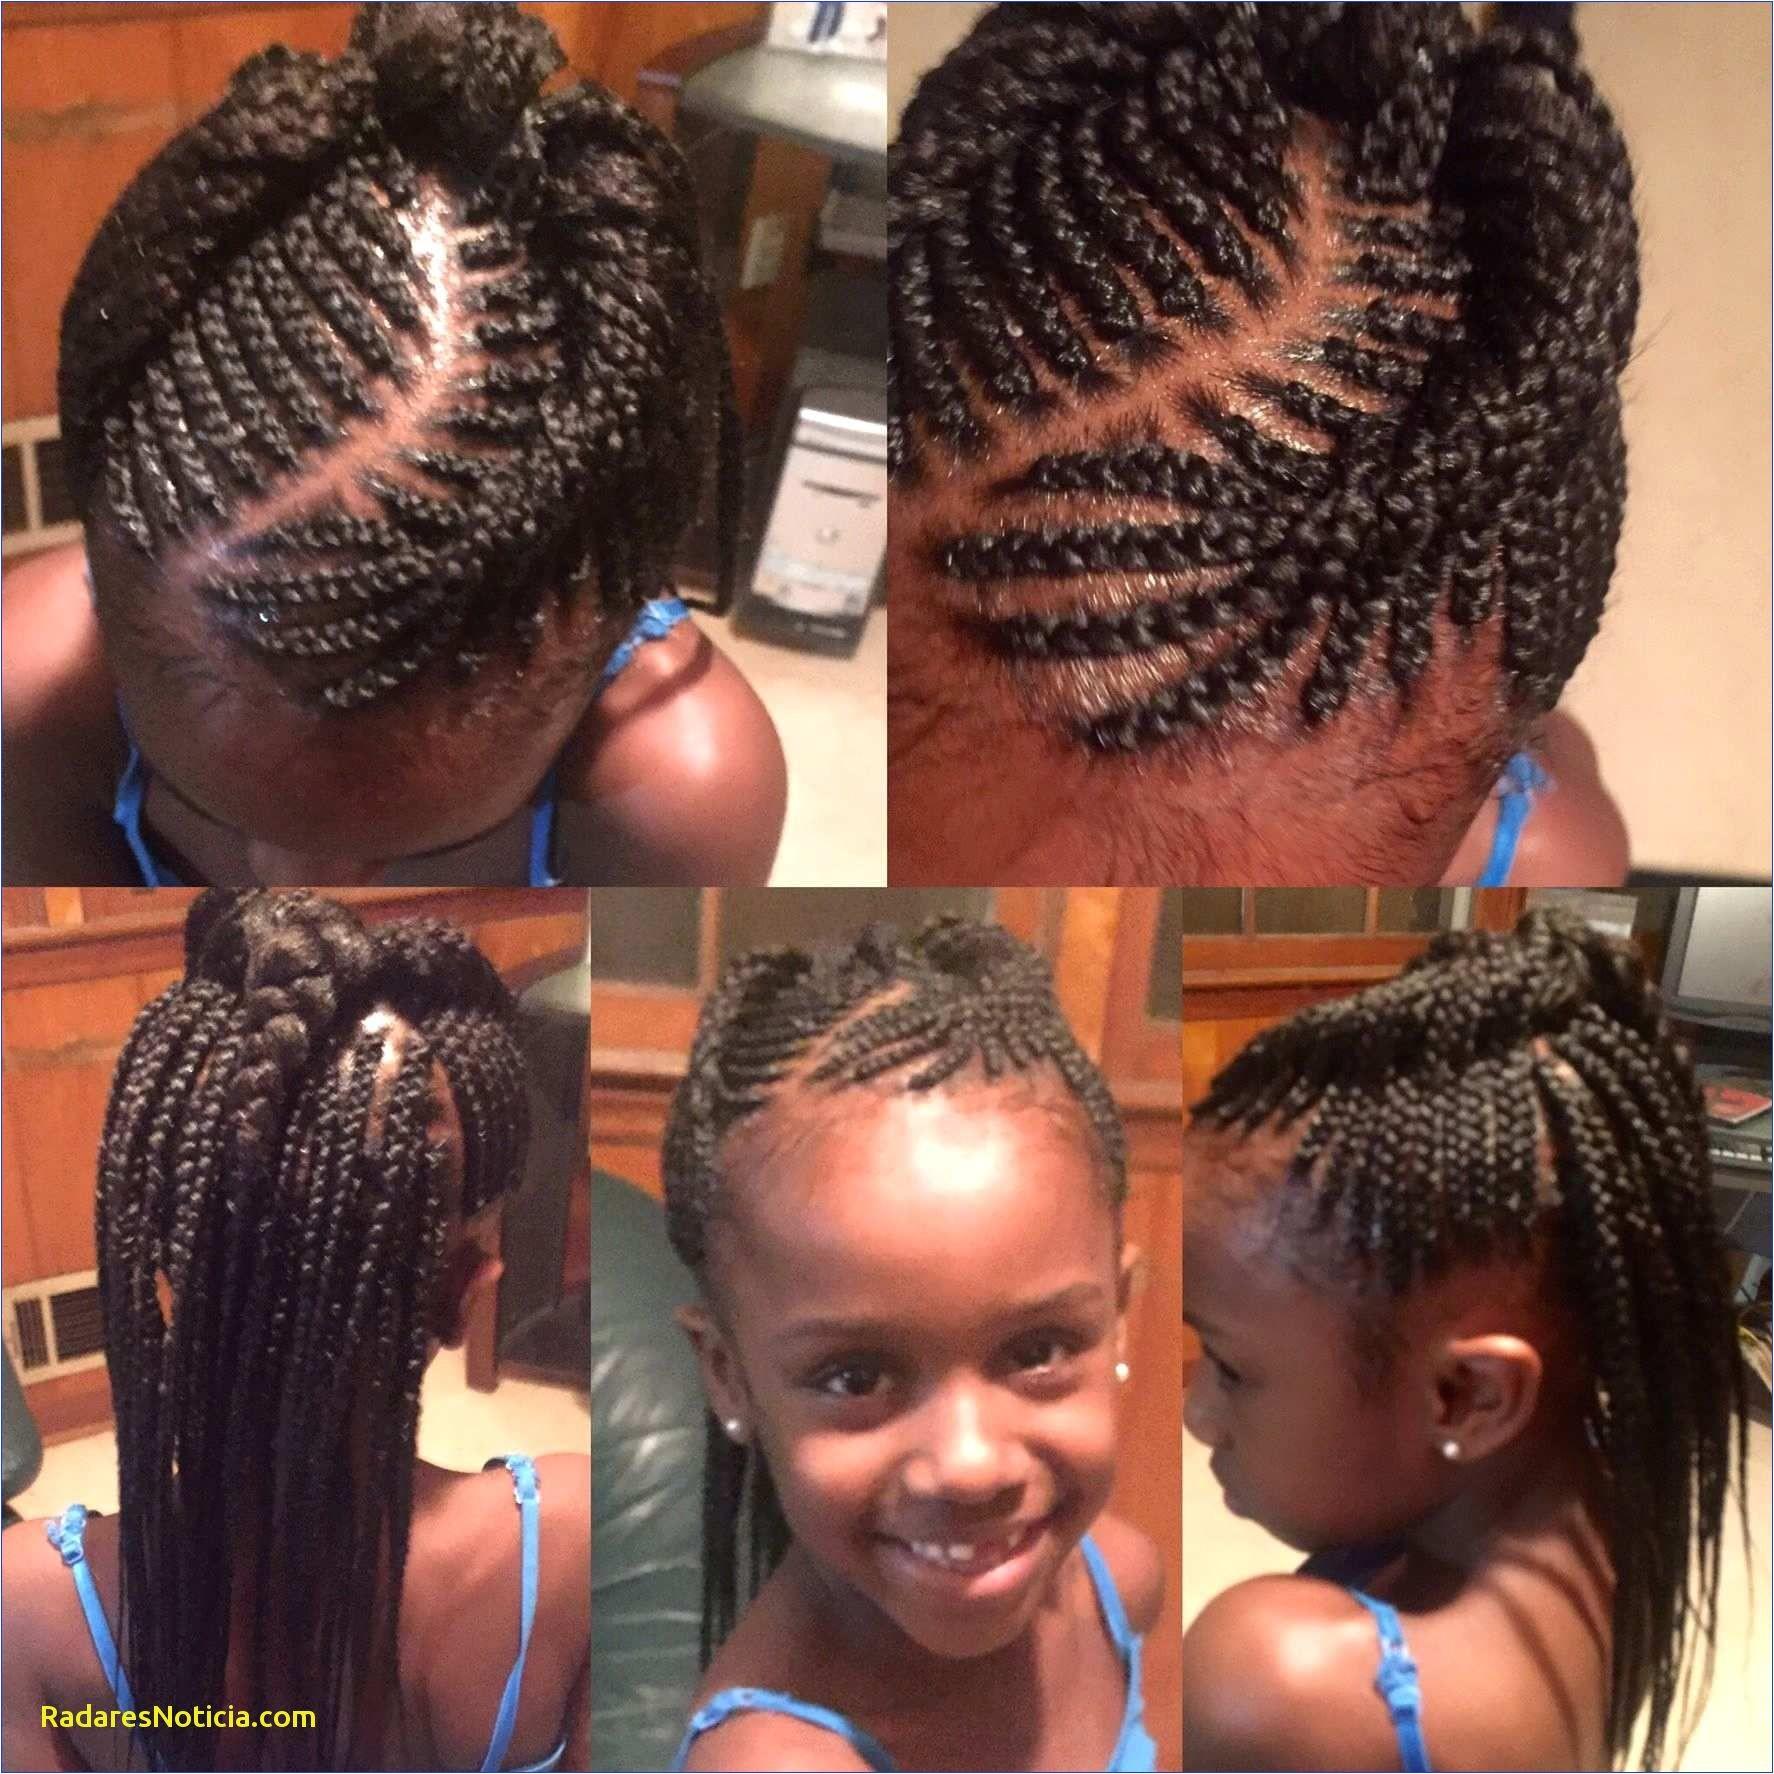 Kids Braids Styles with Beads Kids Braided Hairstyles with Beads Awesome Amazing Braid Hairstyles